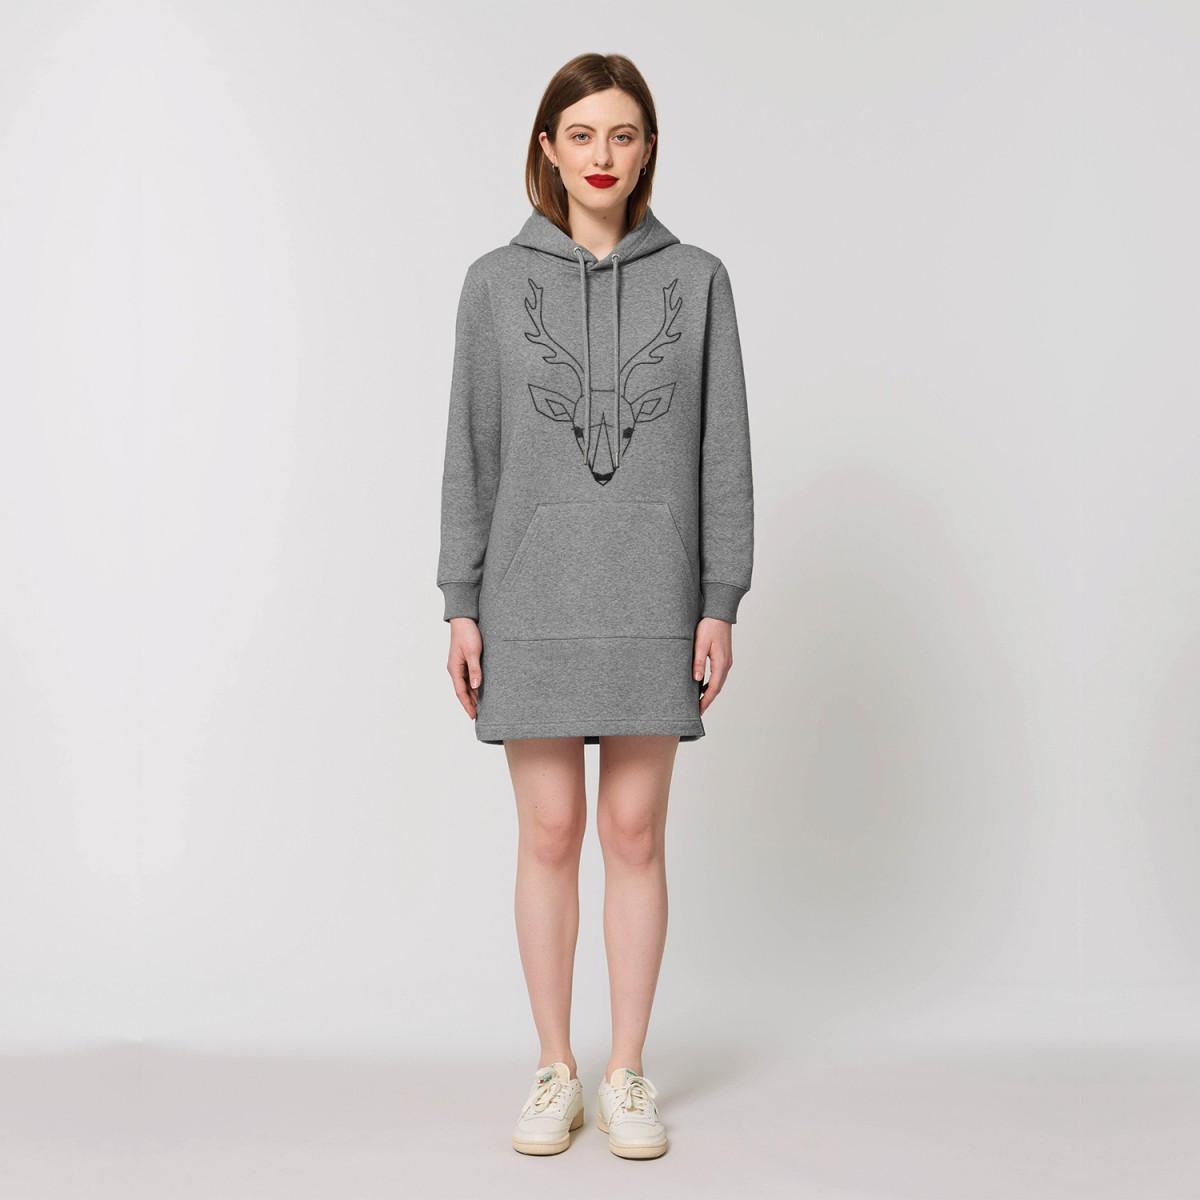 melike Sweatshirtkleid GLITZER HIRSCH grau melange